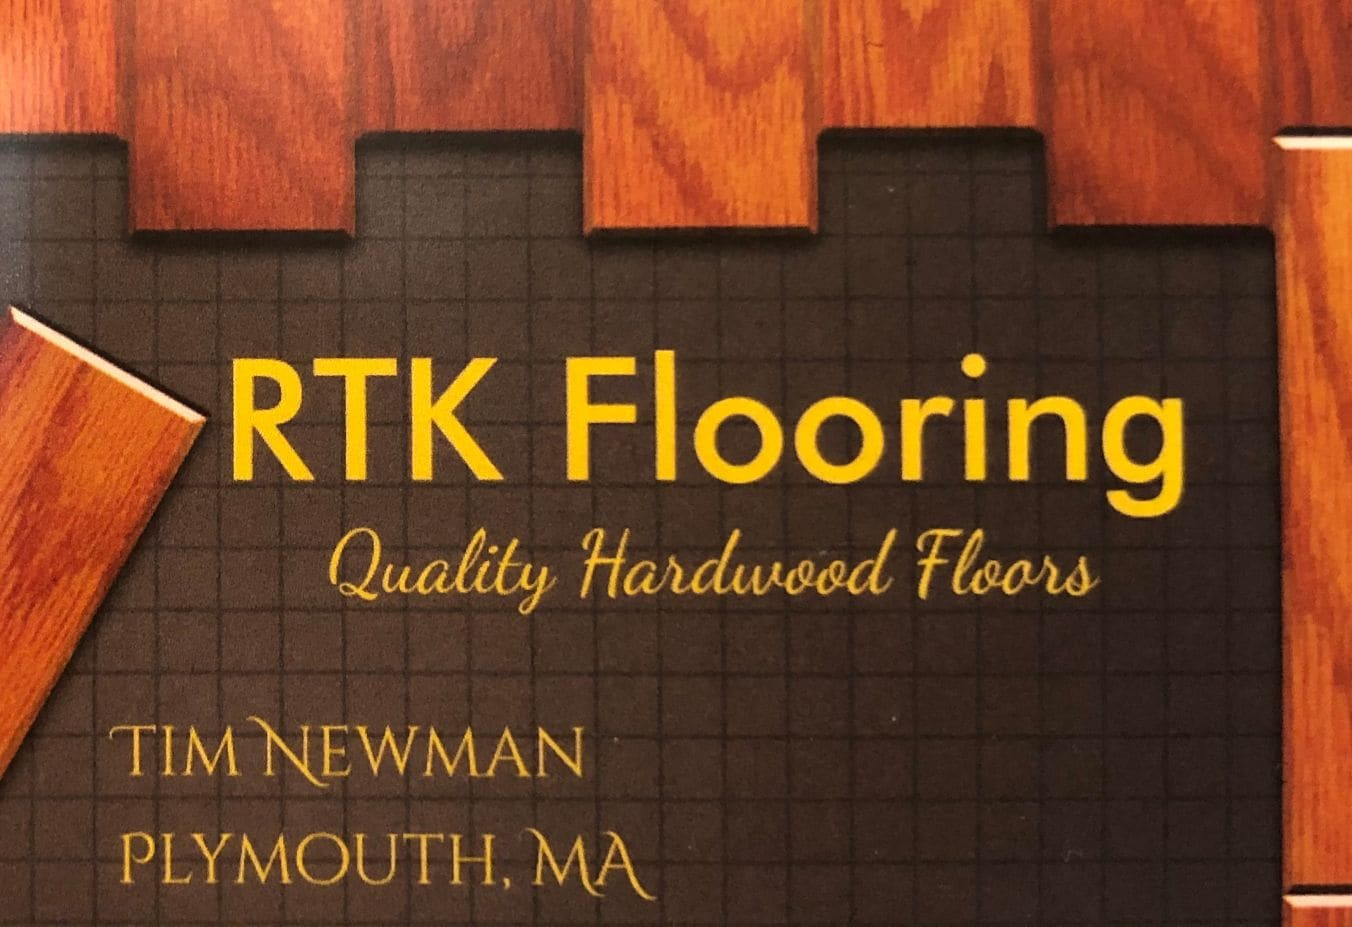 RTK Flooring